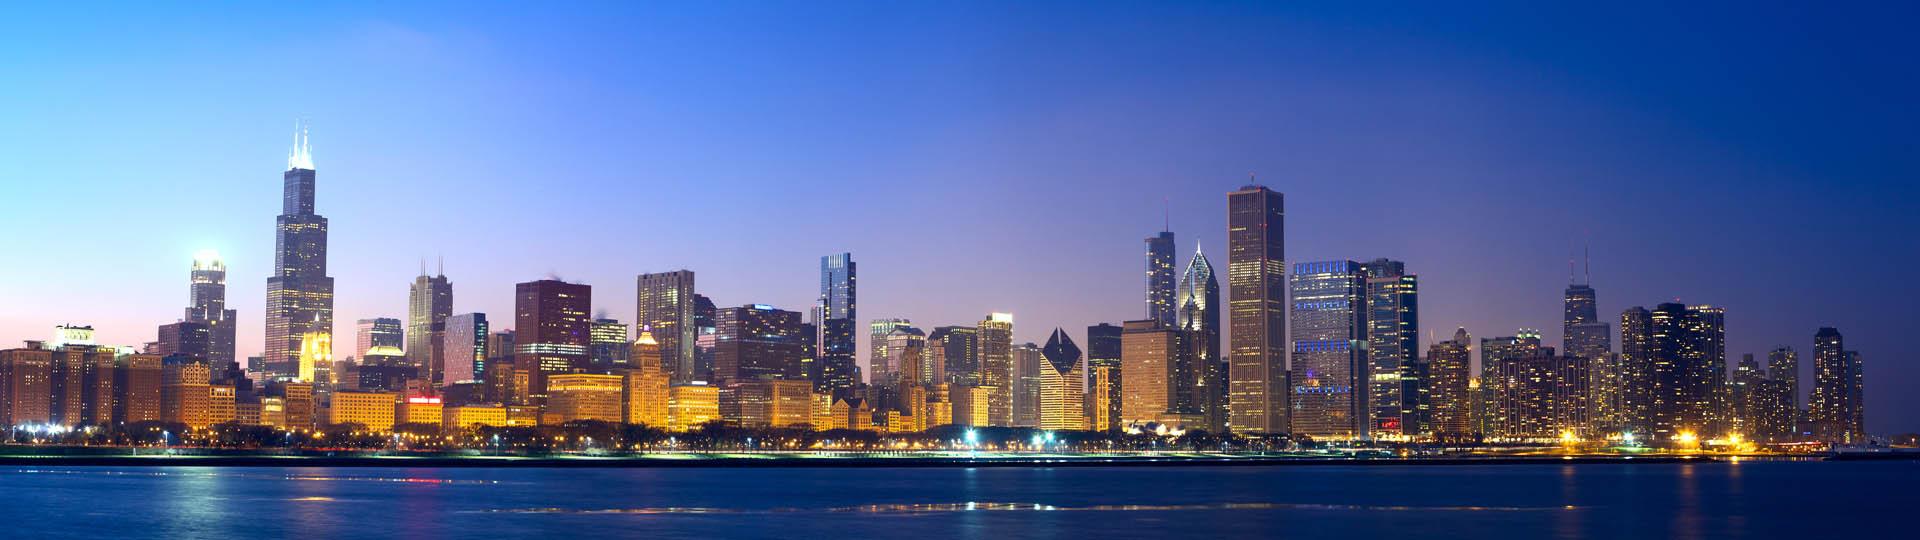 Investors In Chicago, Illinois